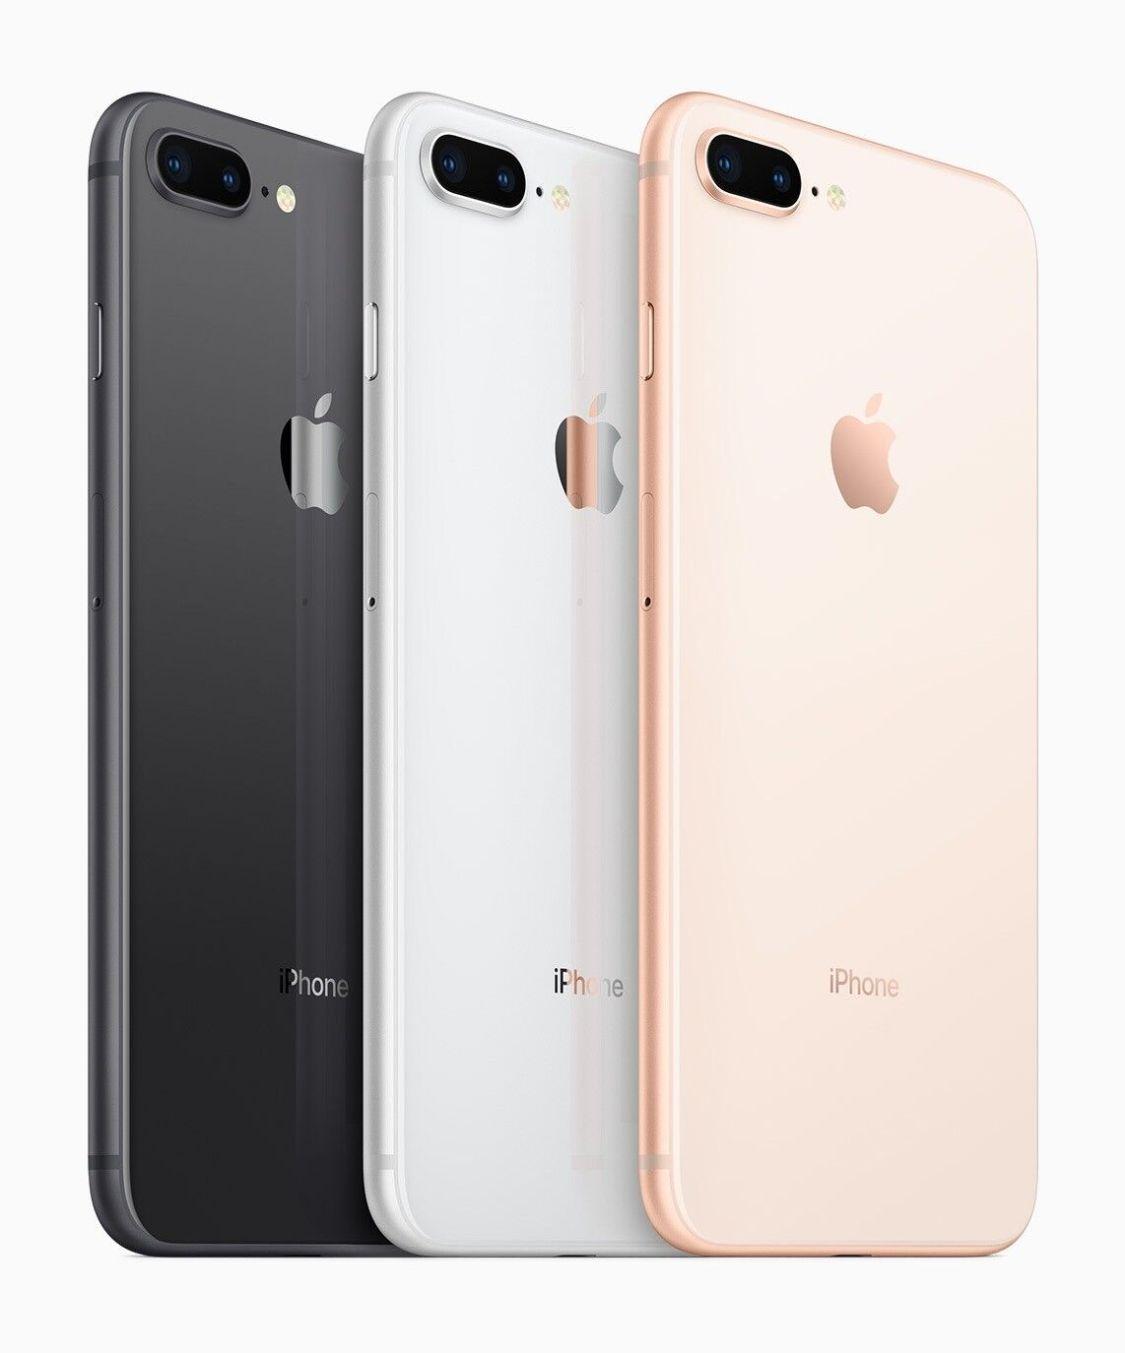 Apple iPhone 8 Plus - 64GB - 256GB - Spacegrau - Silber - Gold - Red - WOW !